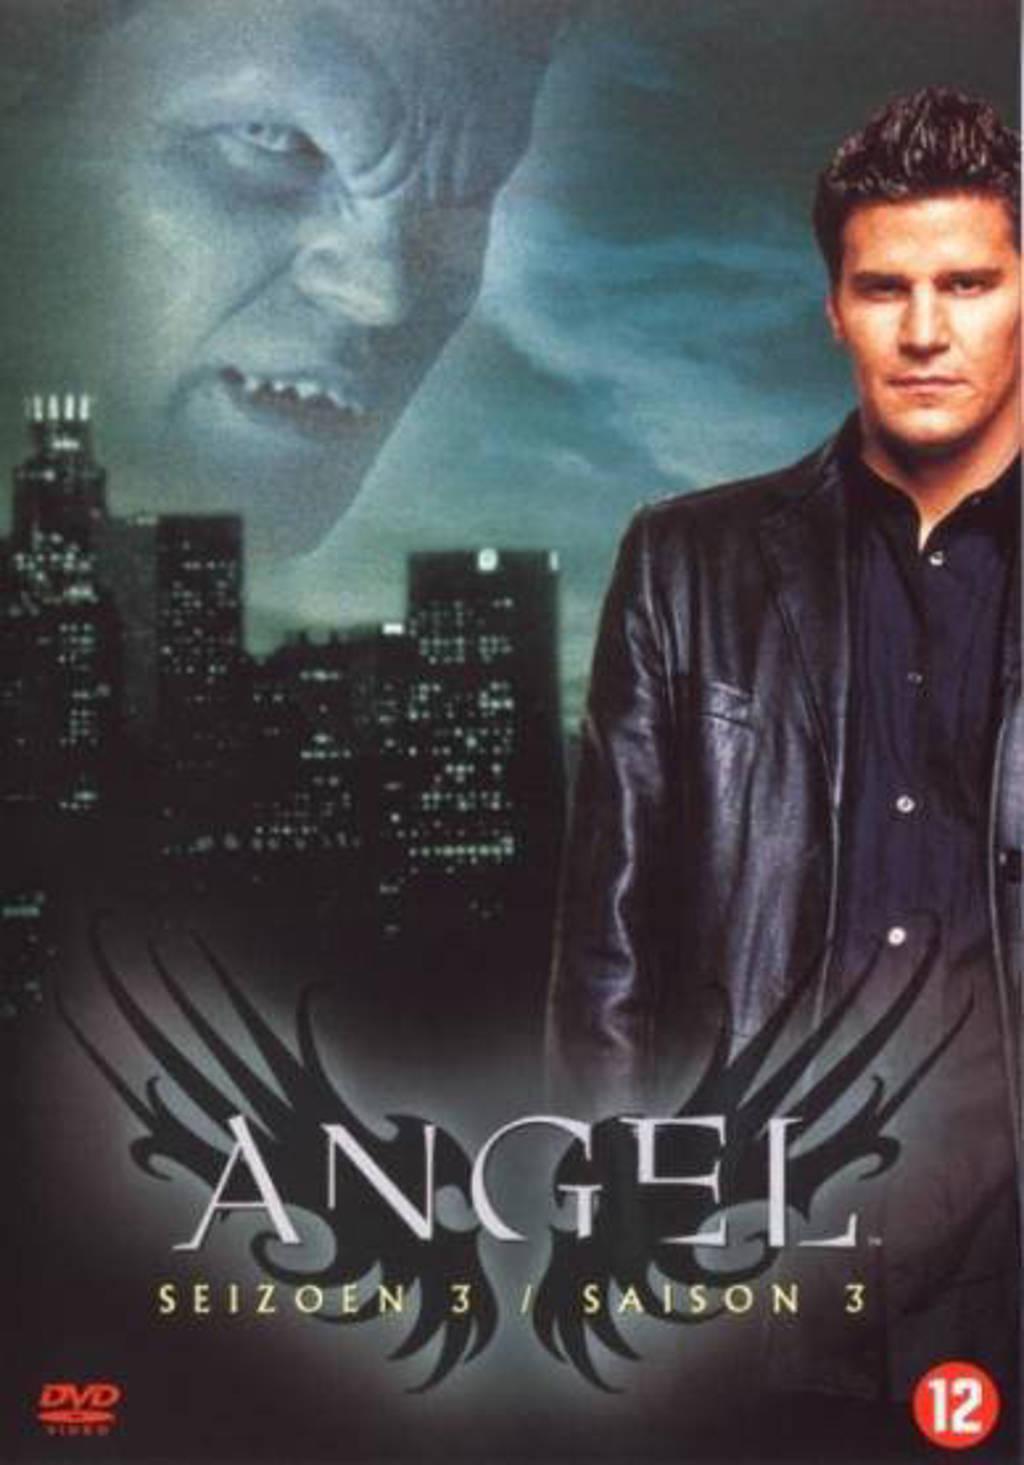 Angel - Seizoen 3 (DVD)